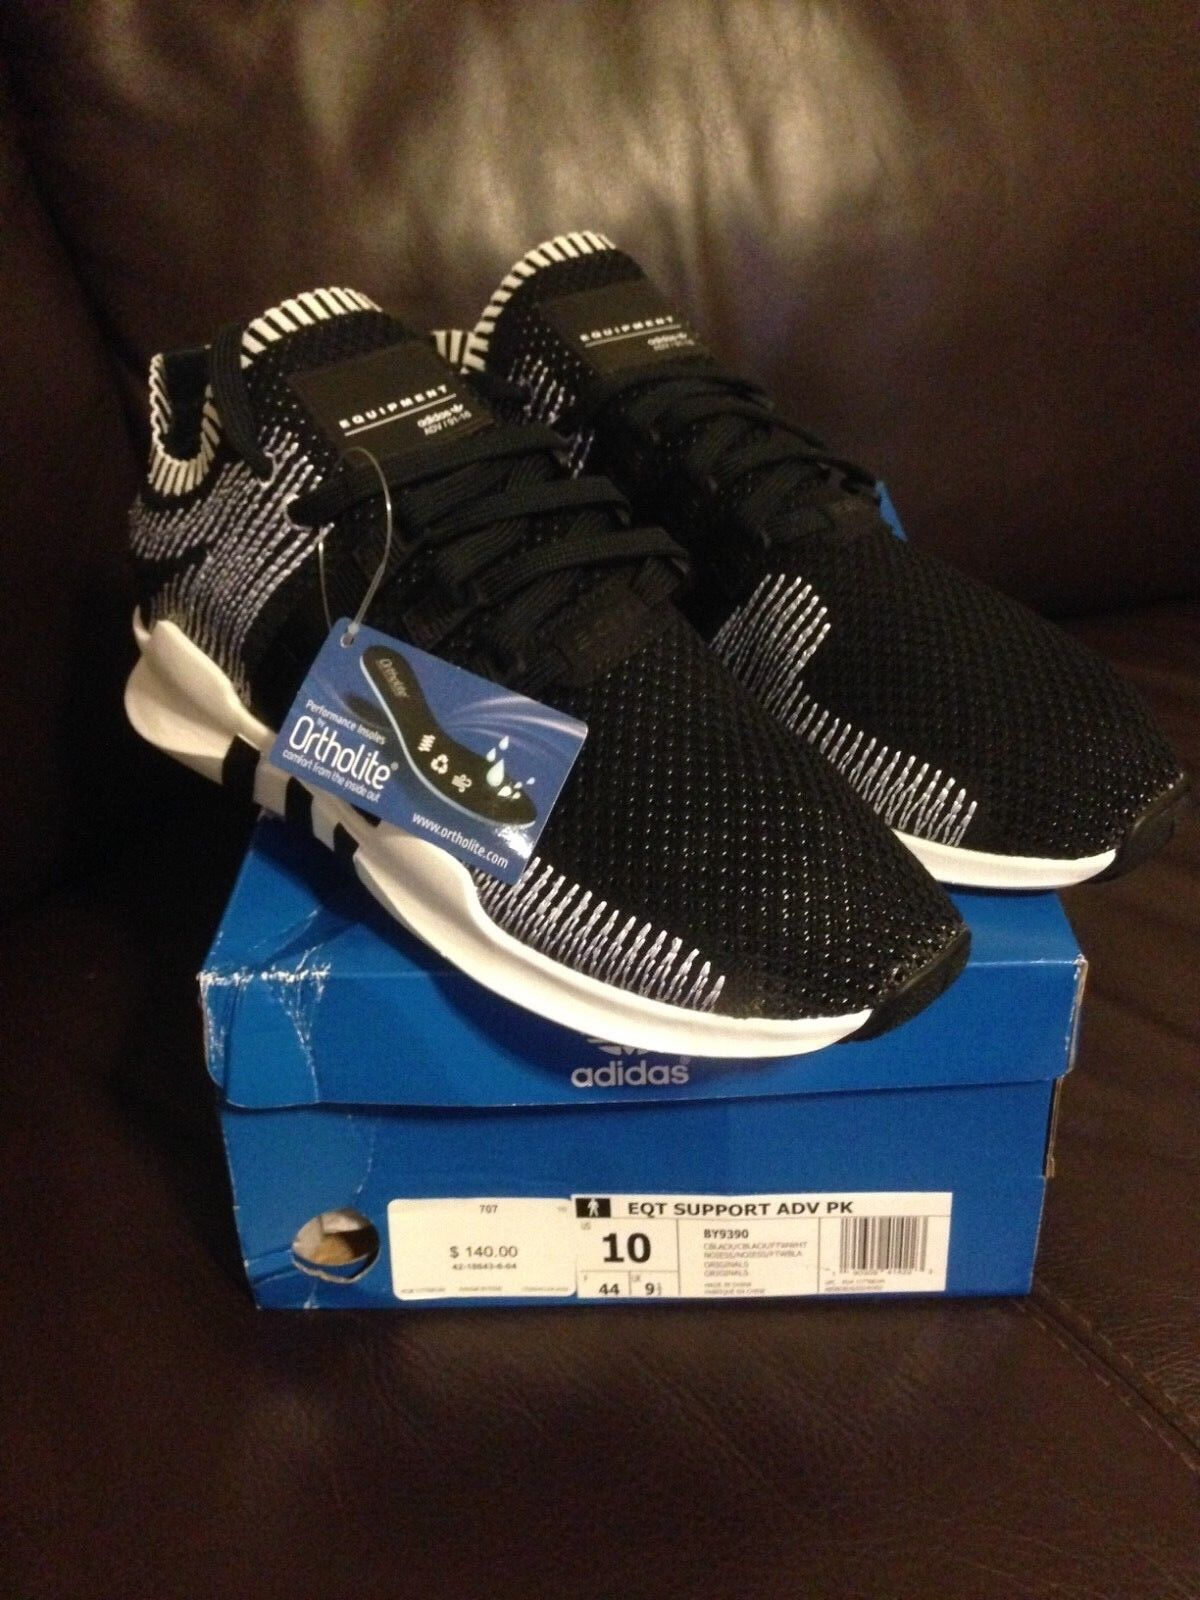 Adidas Originals Equipment Support EQT EQT EQT ADV PK nero Whte Running New Uomo BY9390 554005